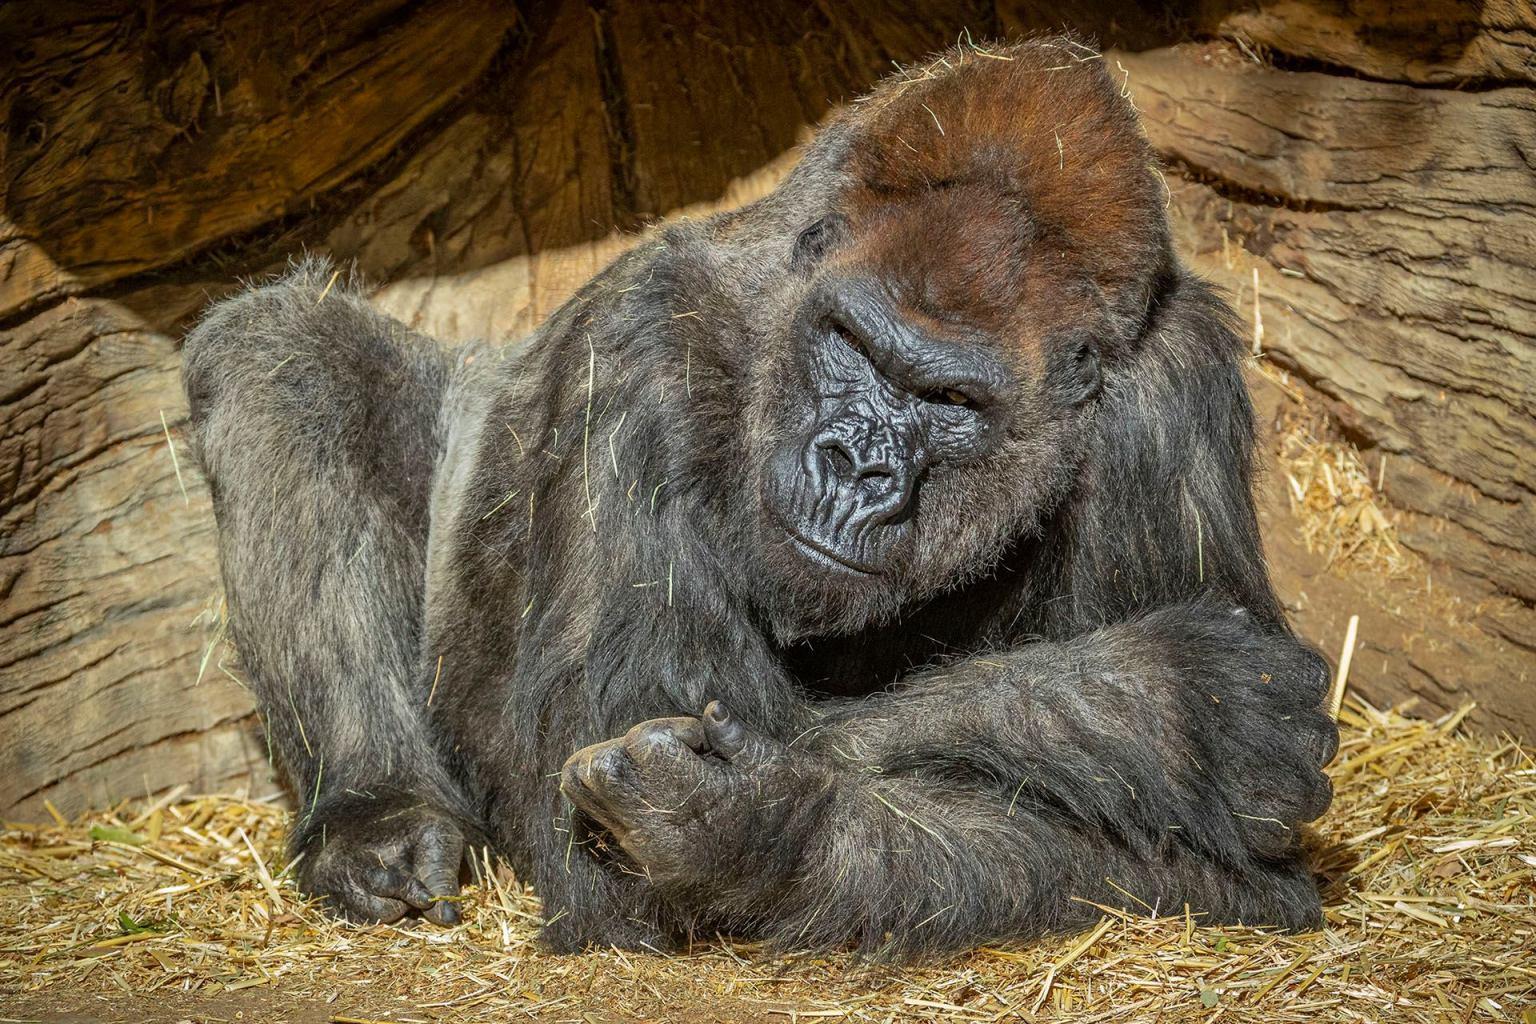 Two Gorillas in San Diego Test Positive for Coronavirus